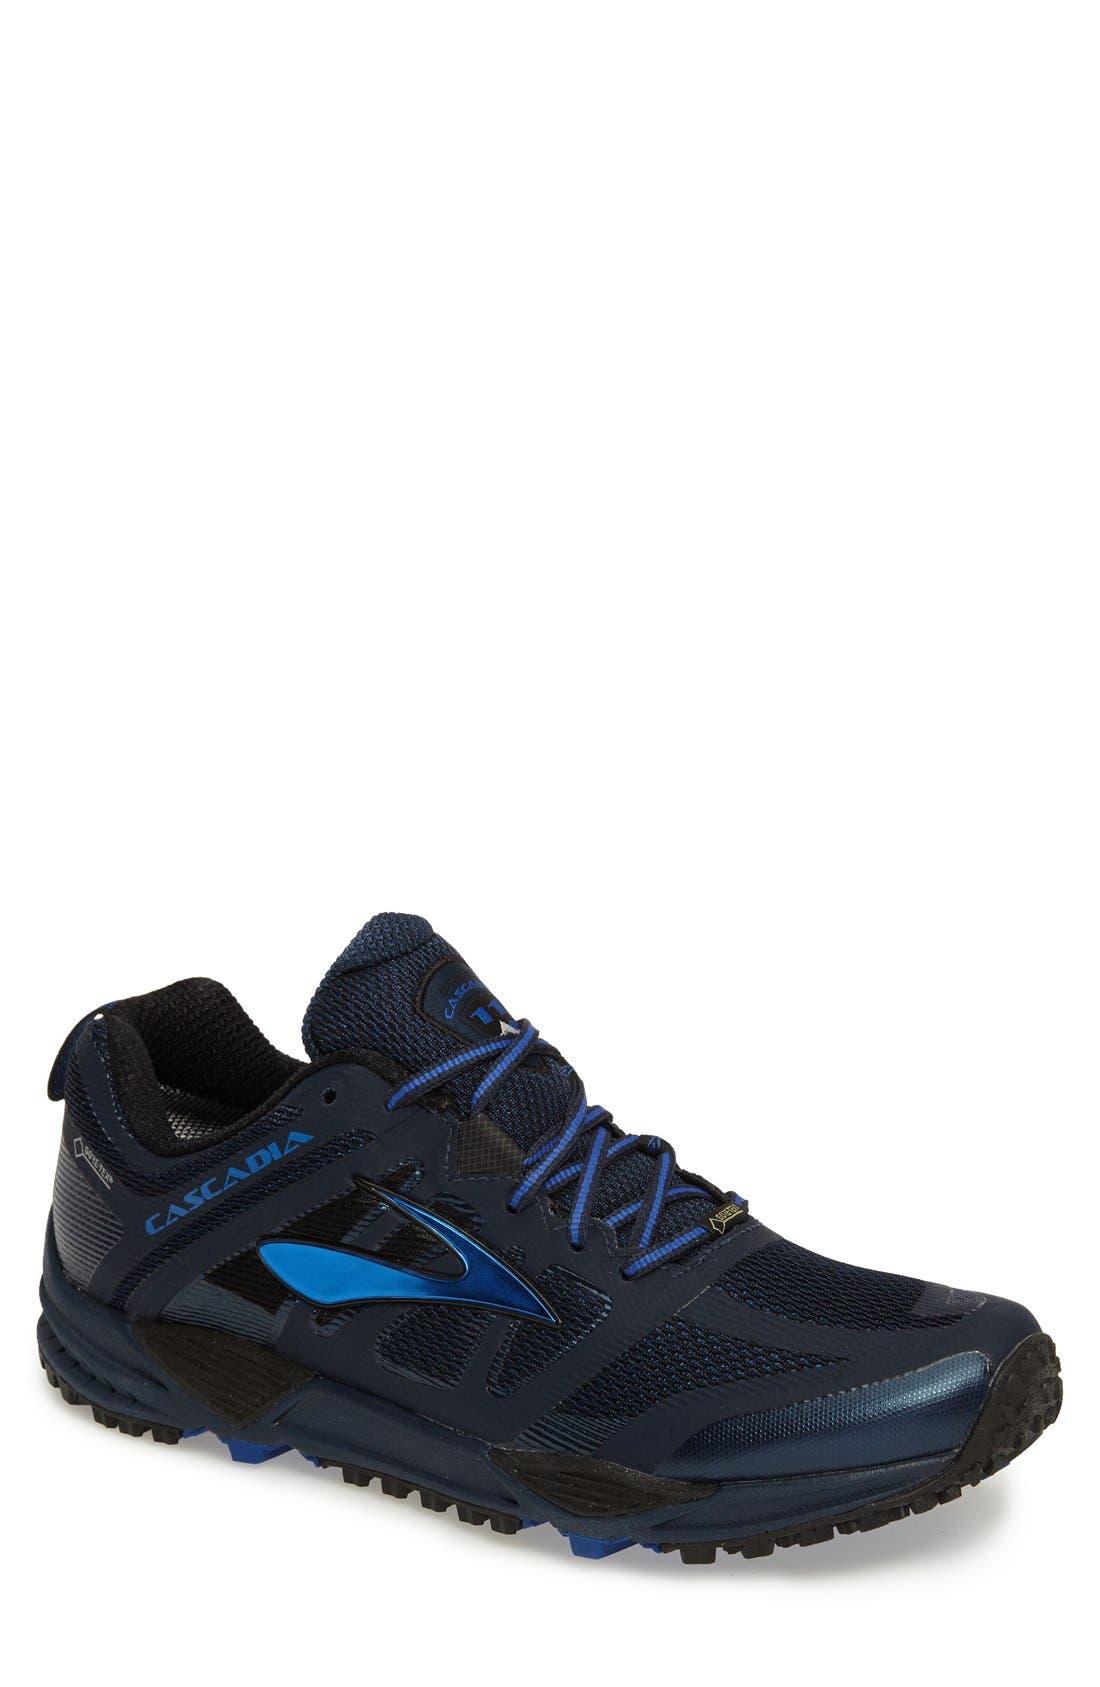 Cascadia 11 GTX Trail Running Shoe,                             Main thumbnail 1, color,                             Dress Blue/ Electric Blue